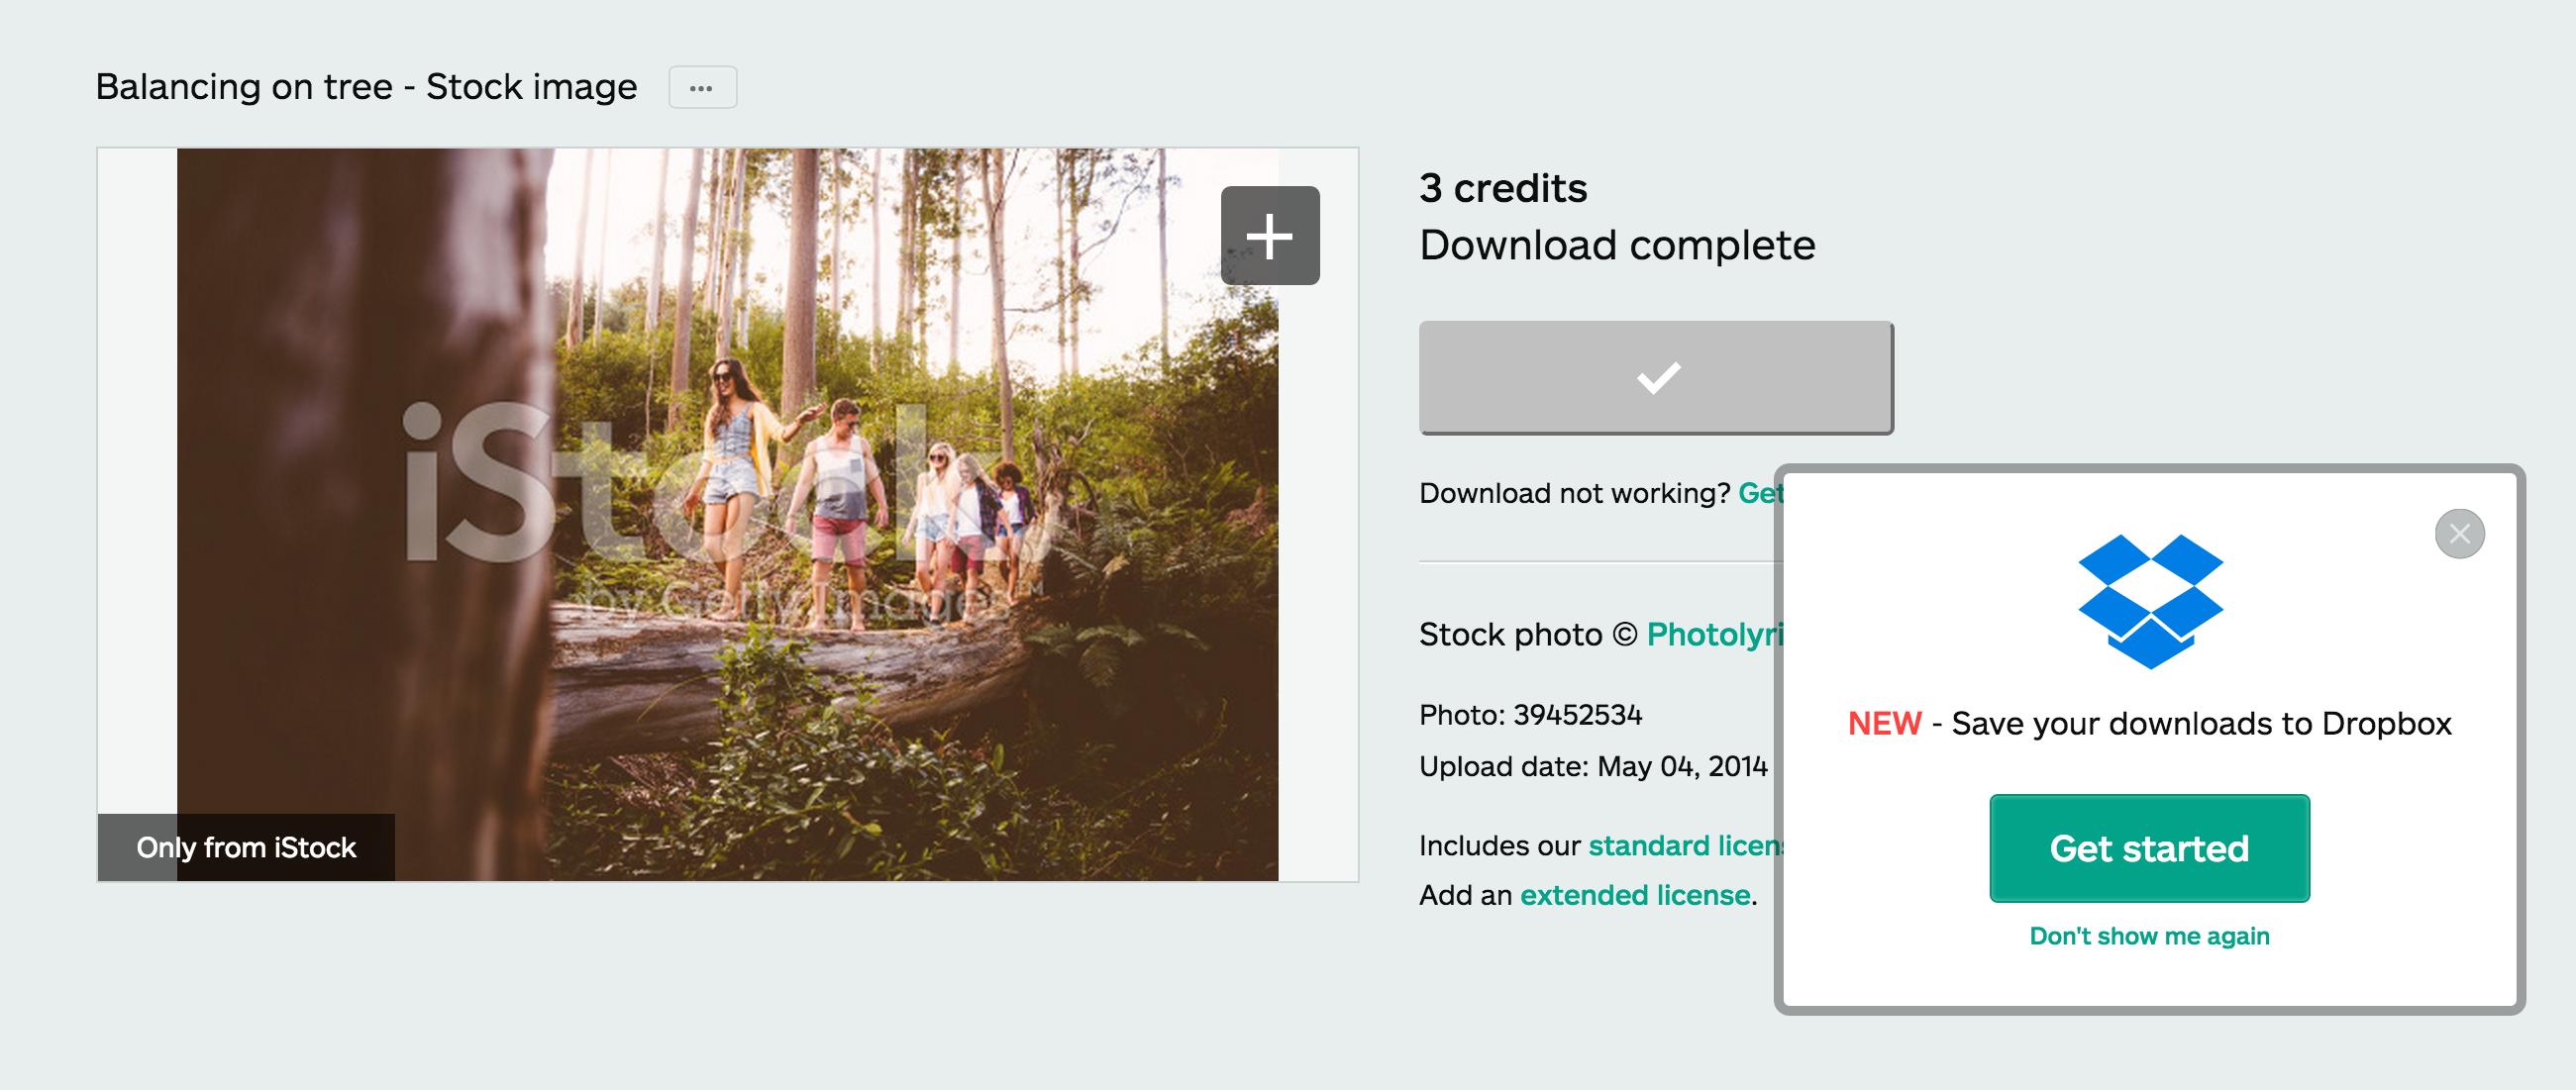 iStock-schermafdruk 1